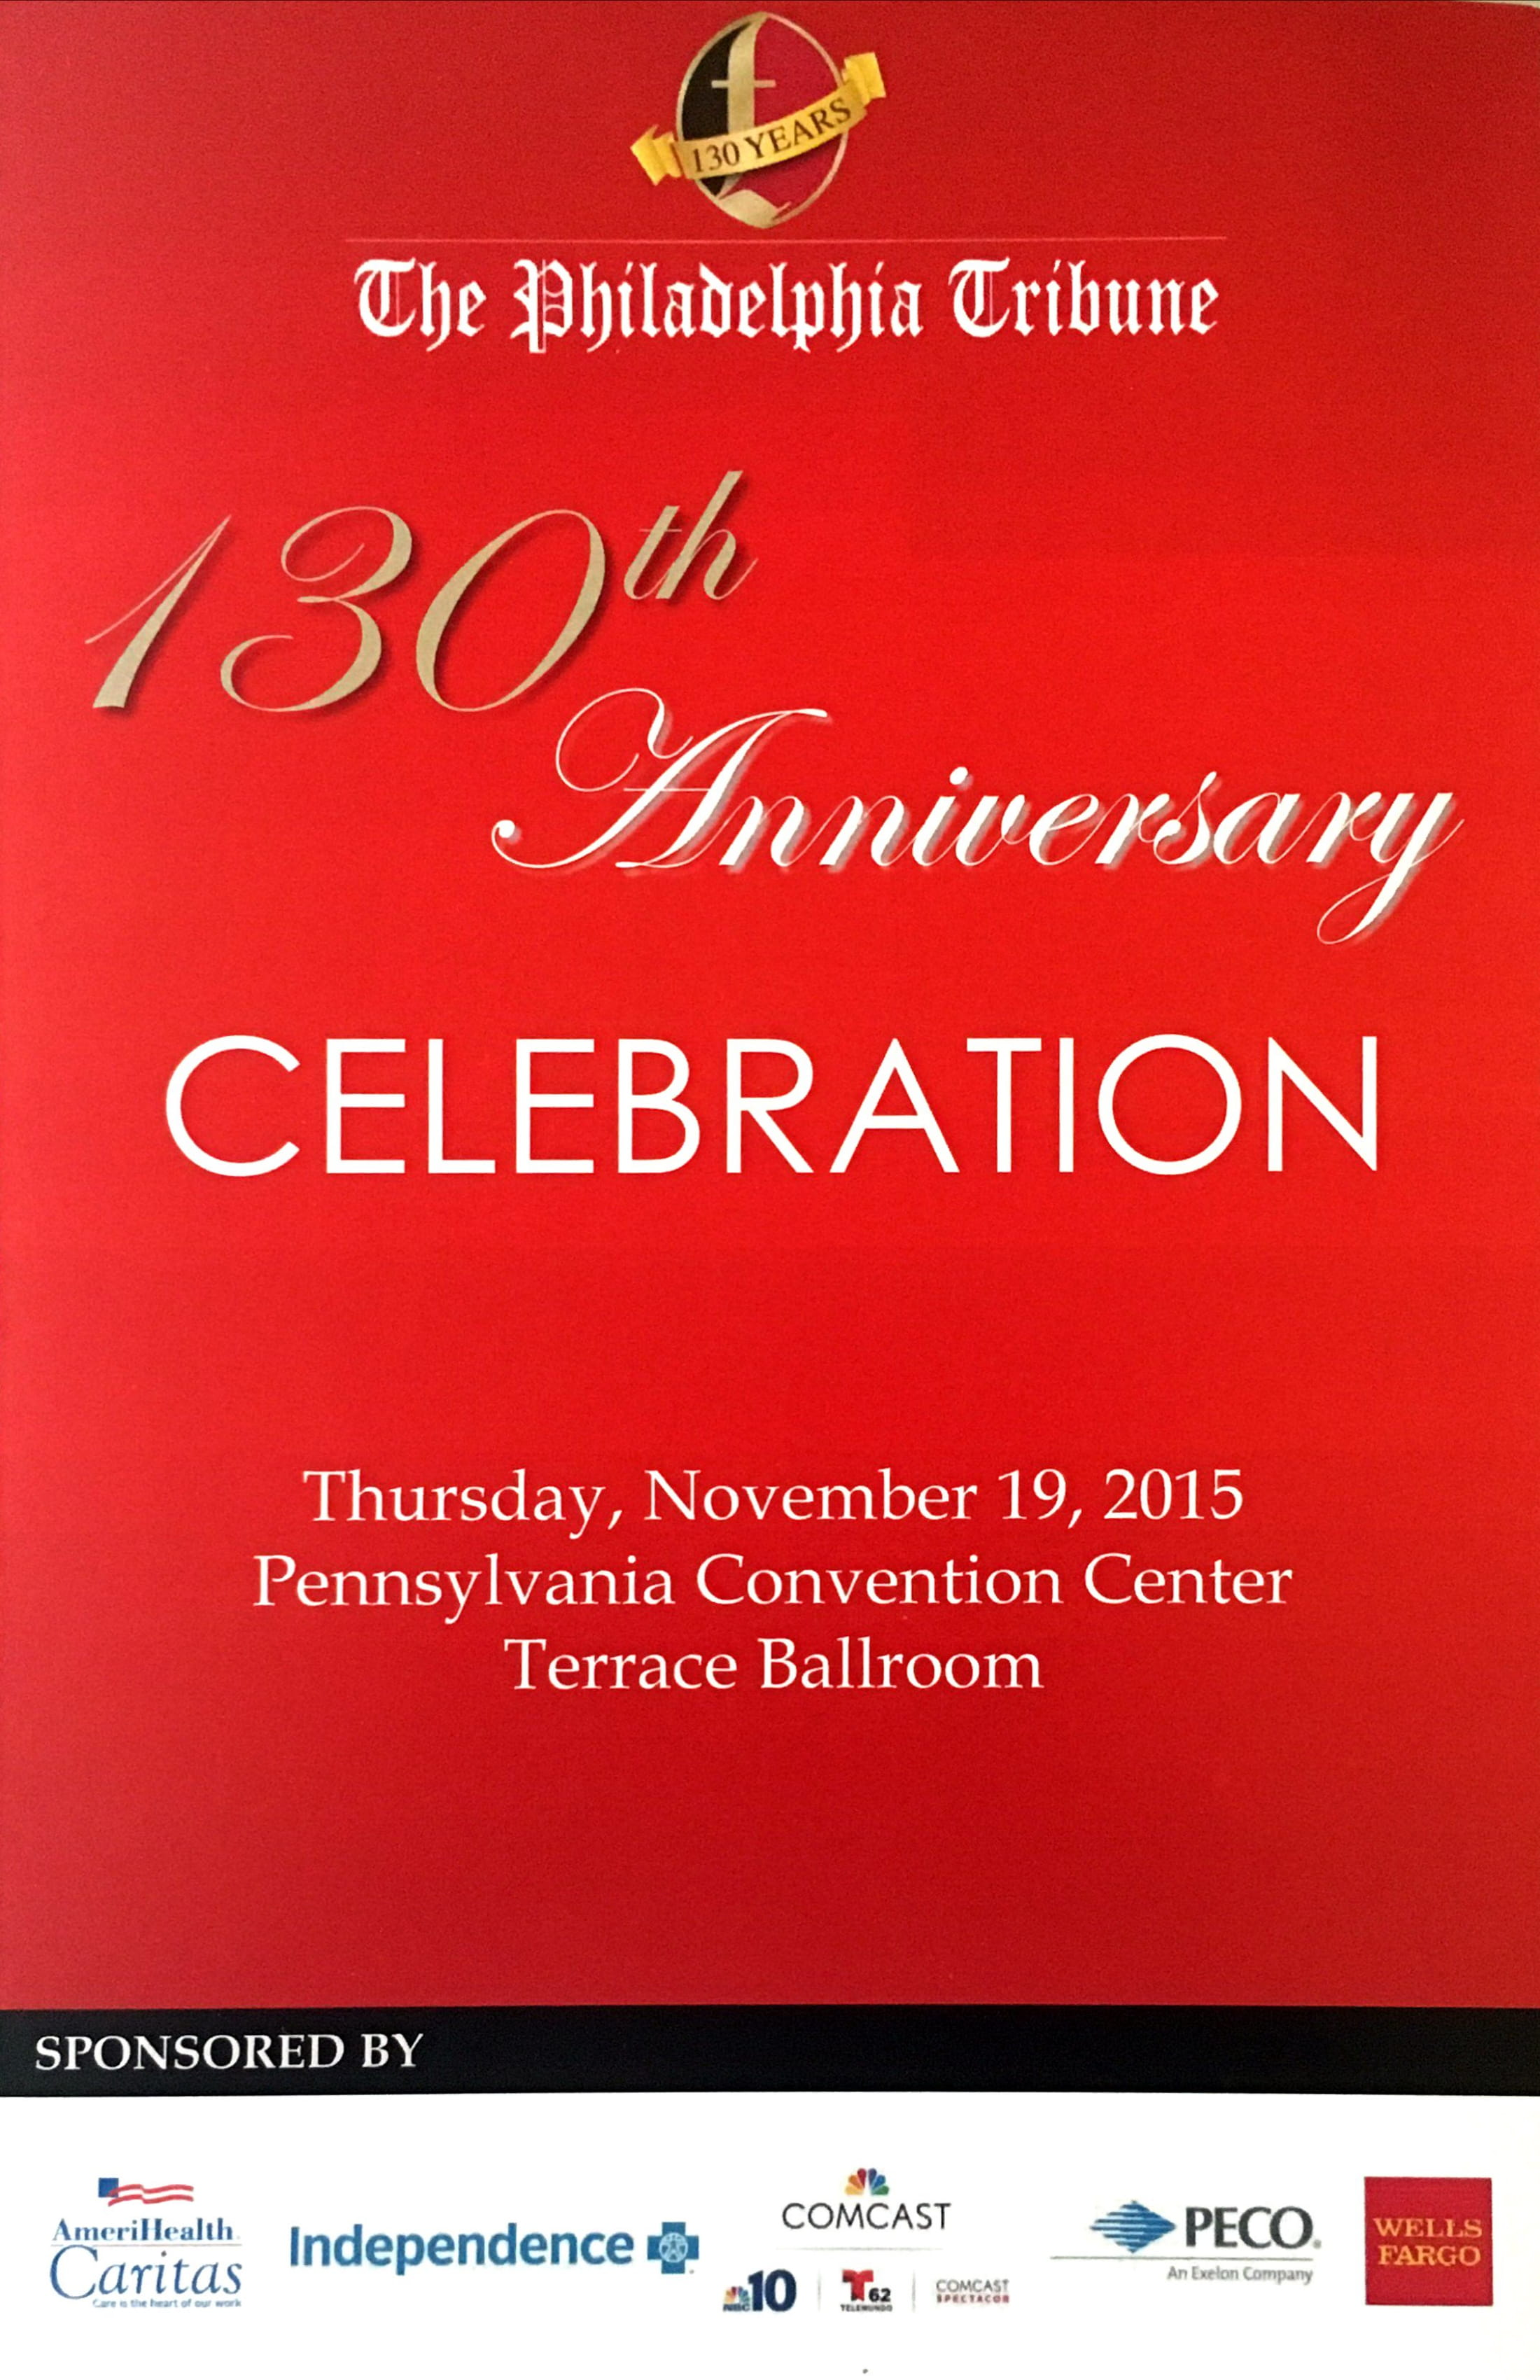 Tribune's 130th Anniversary Celebration